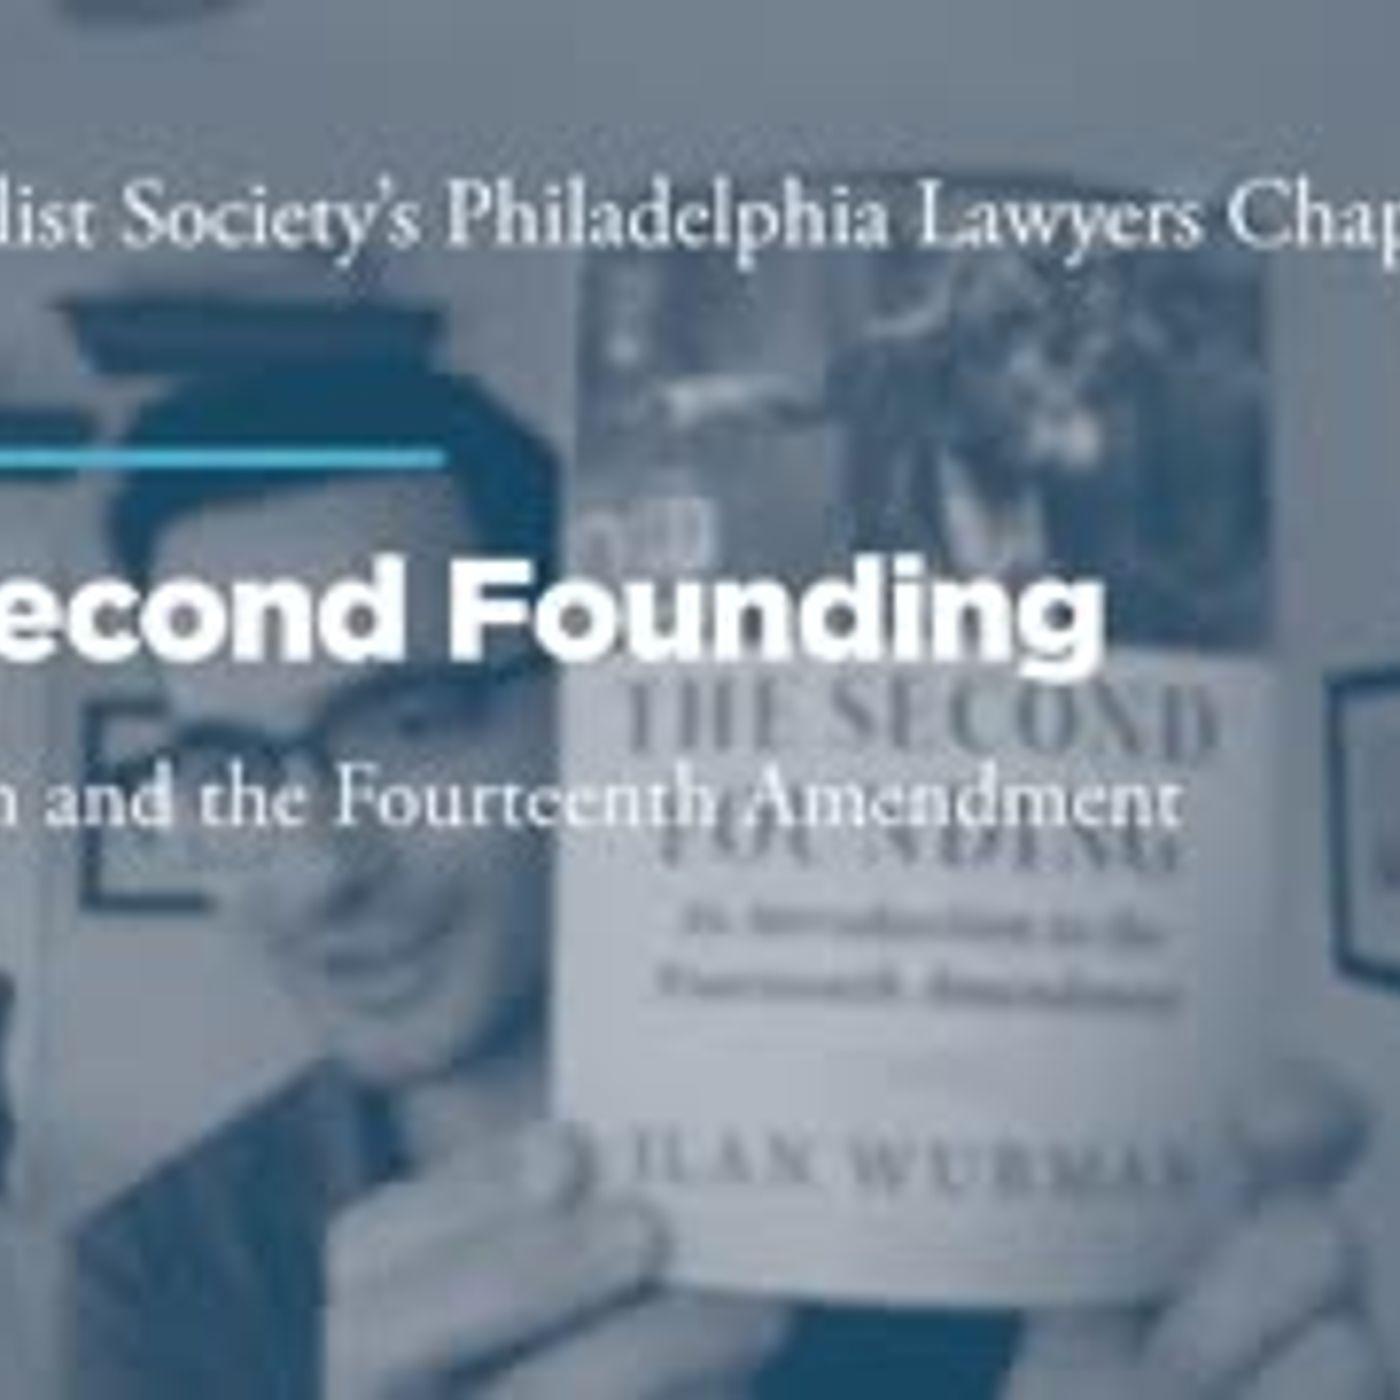 The Second Founding: Originalism and the Fourteenth Amendment